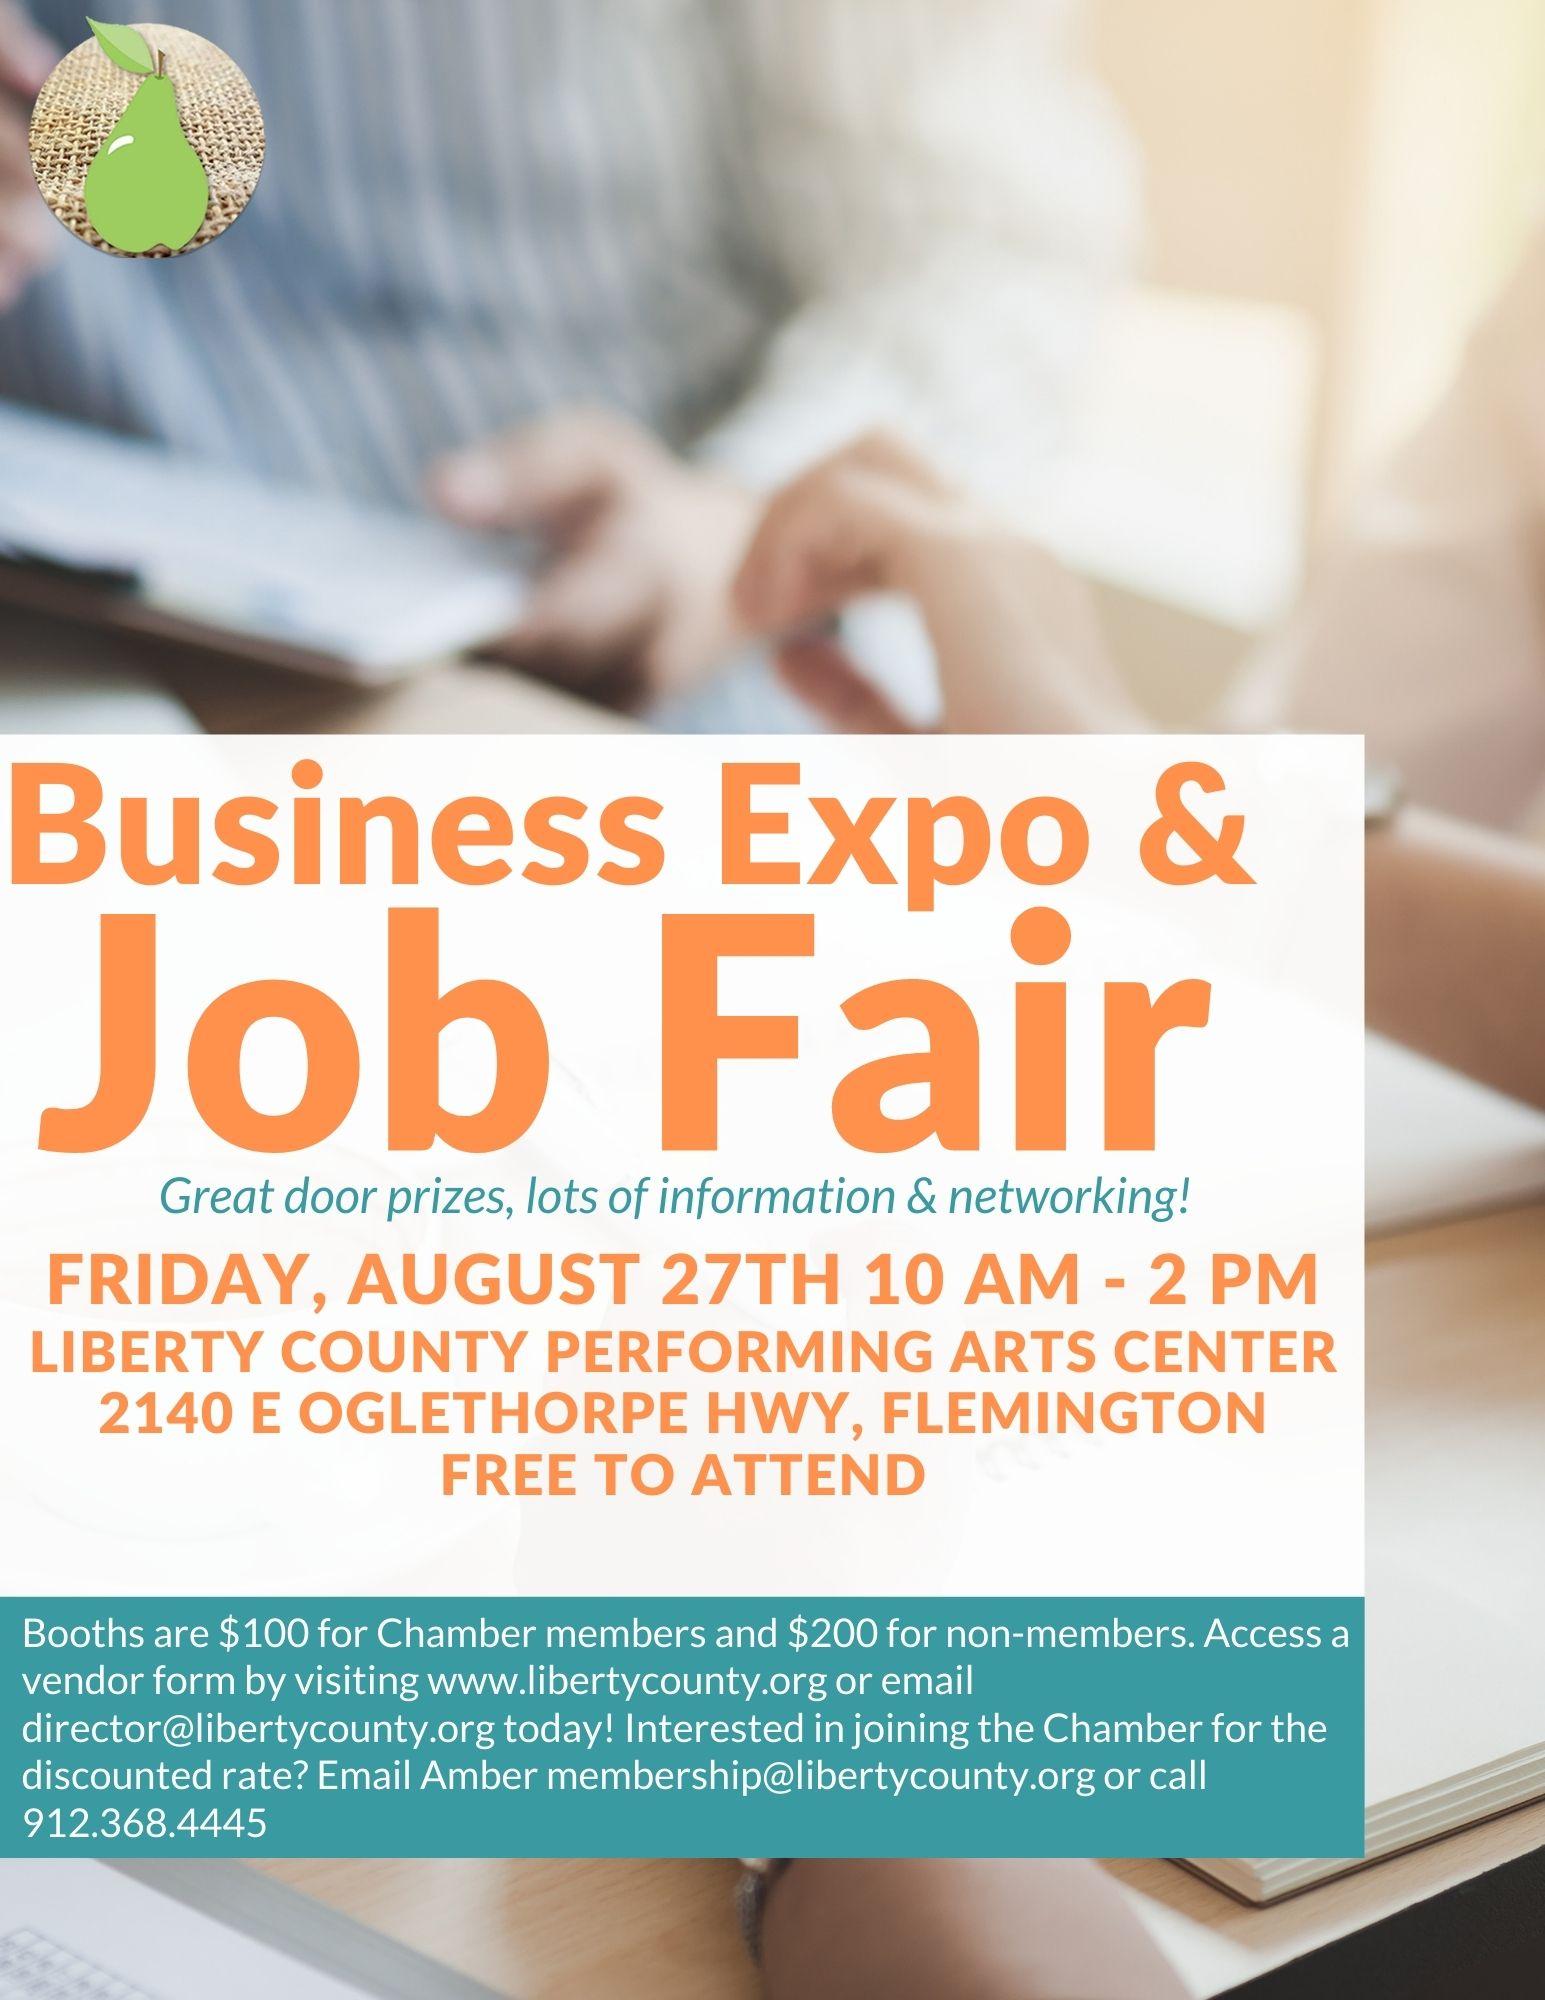 Business Expo and Job Fair